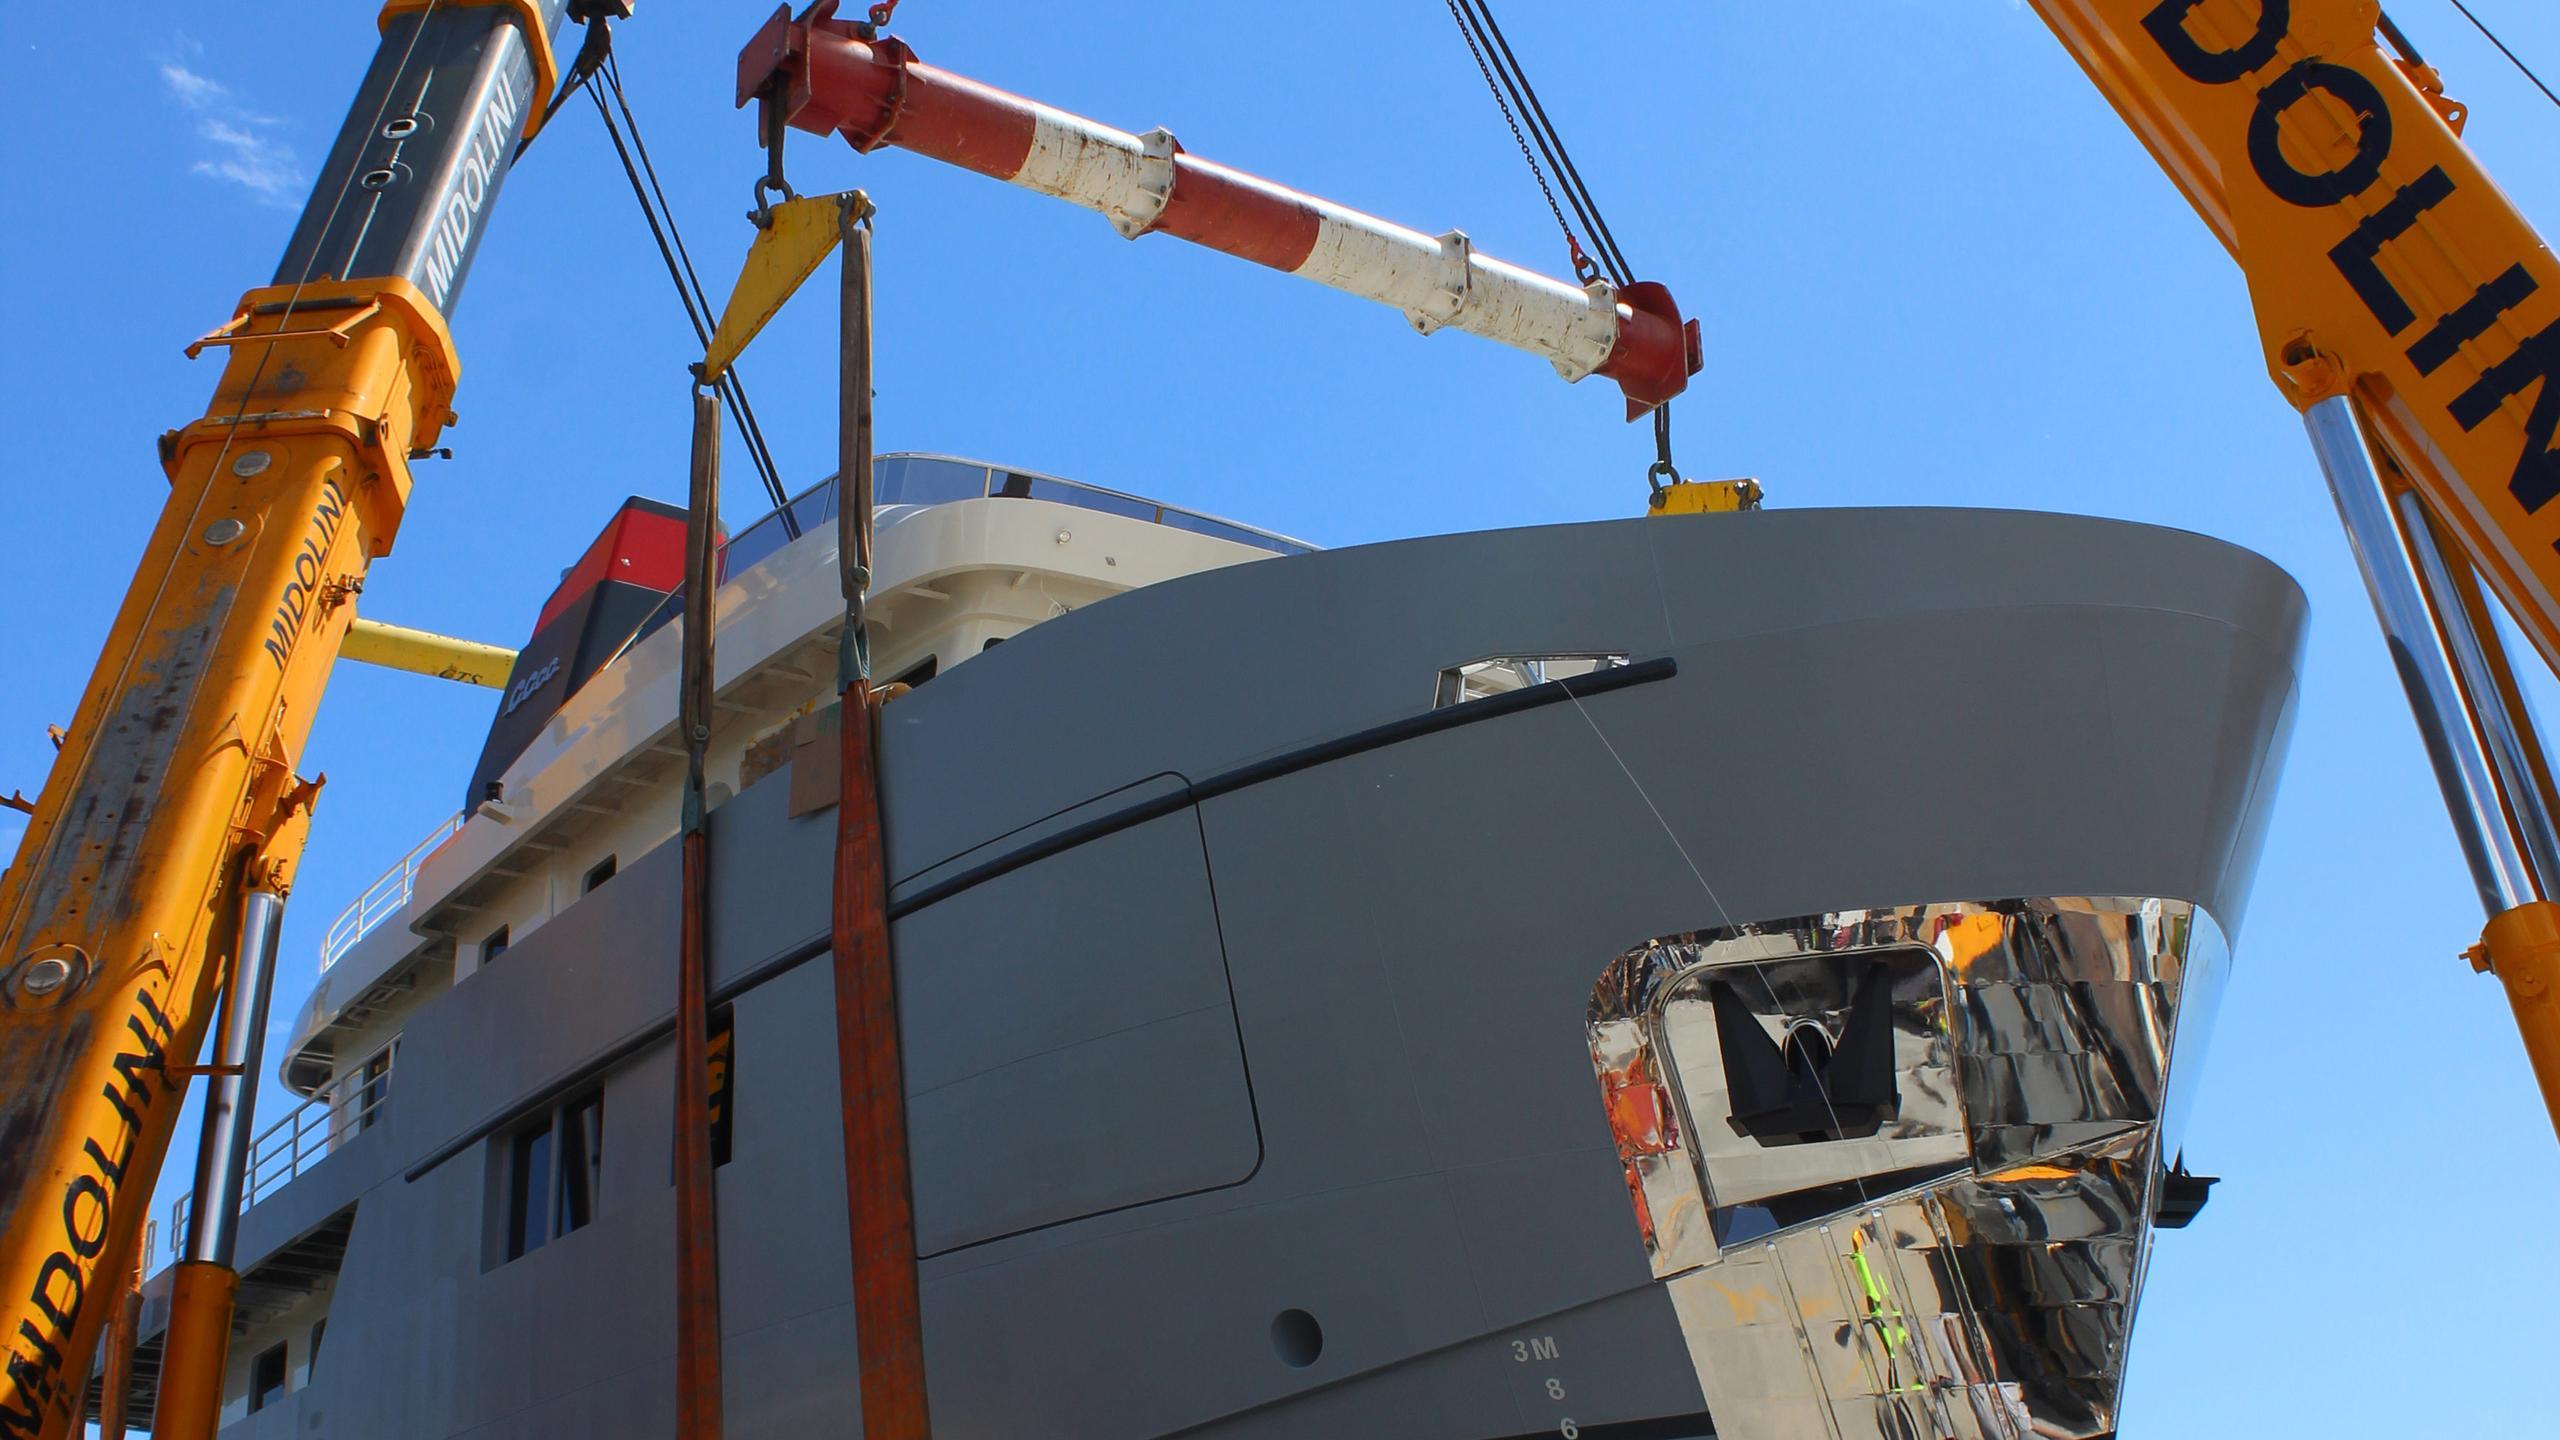 CAROLIN-IV-motor-yacht-mmgi-omega-forte-100-101m-2016-shipyard-bow-cranes